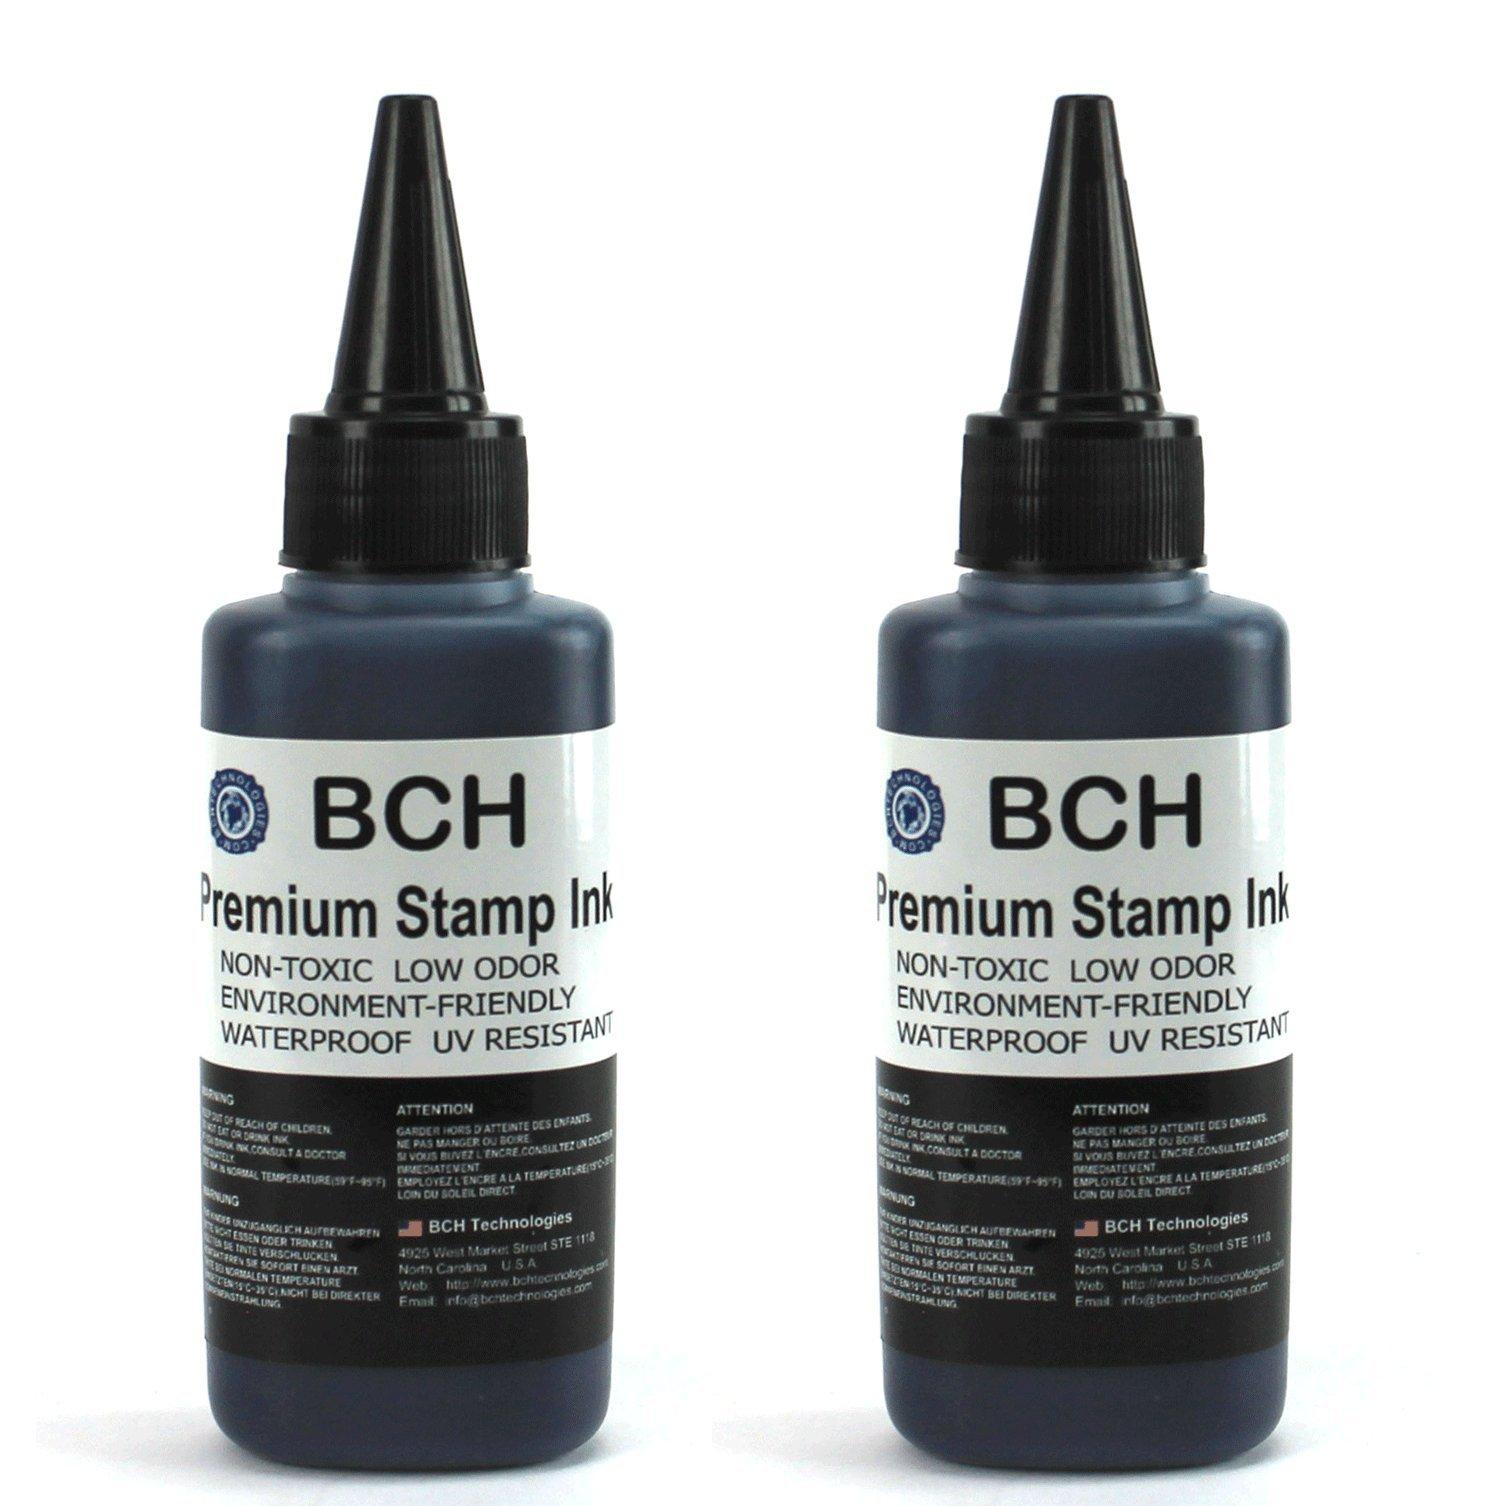 Bulk 2X Black Stamp Ink Refill by BCH - Premium Grade -2.5 oz (75 ml) Ink Per Bottle by BCH